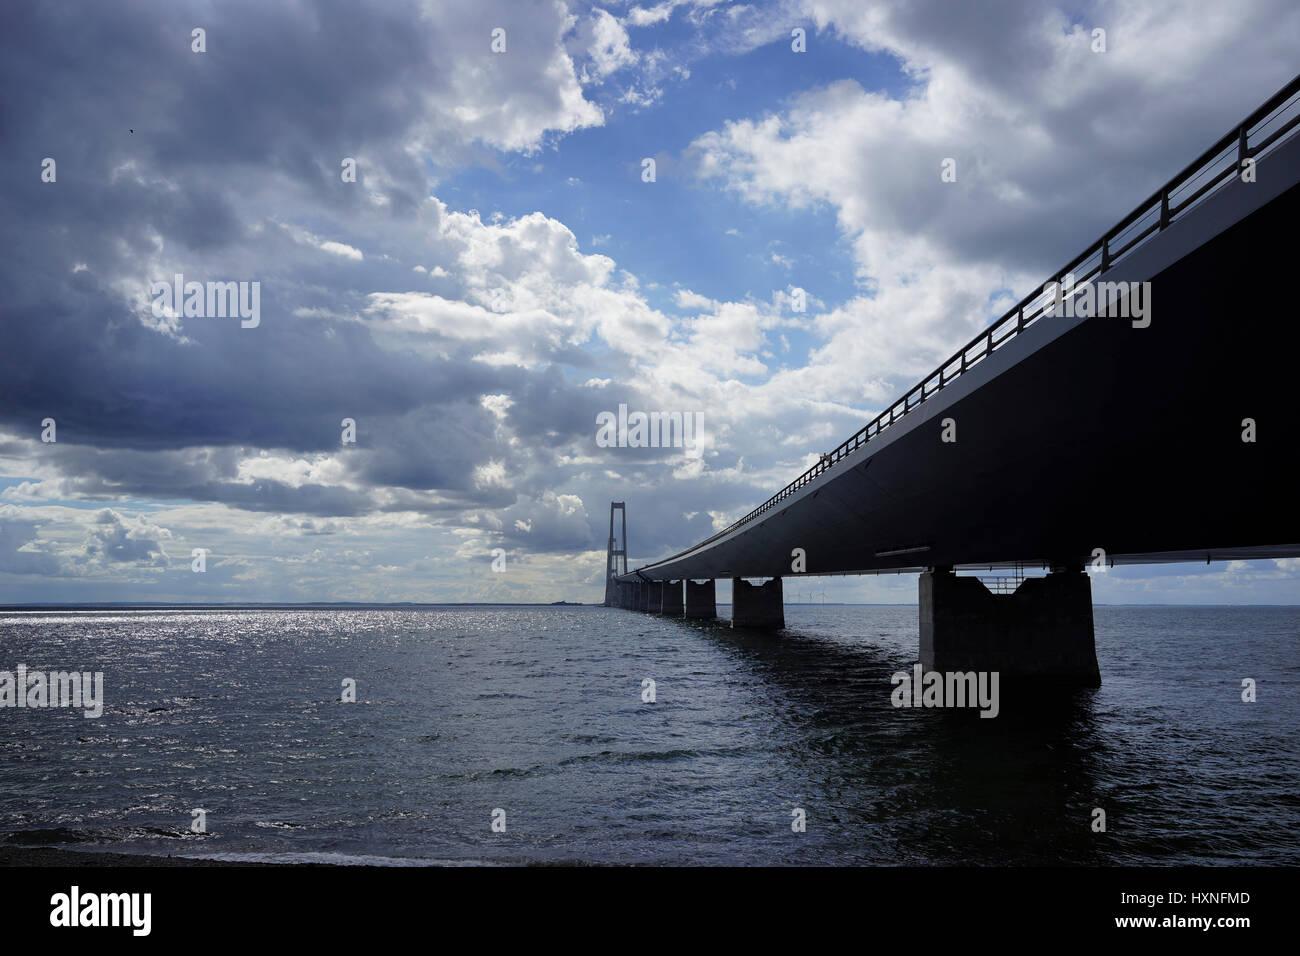 Brück über den Storebelt, Dänemark Stock Photo